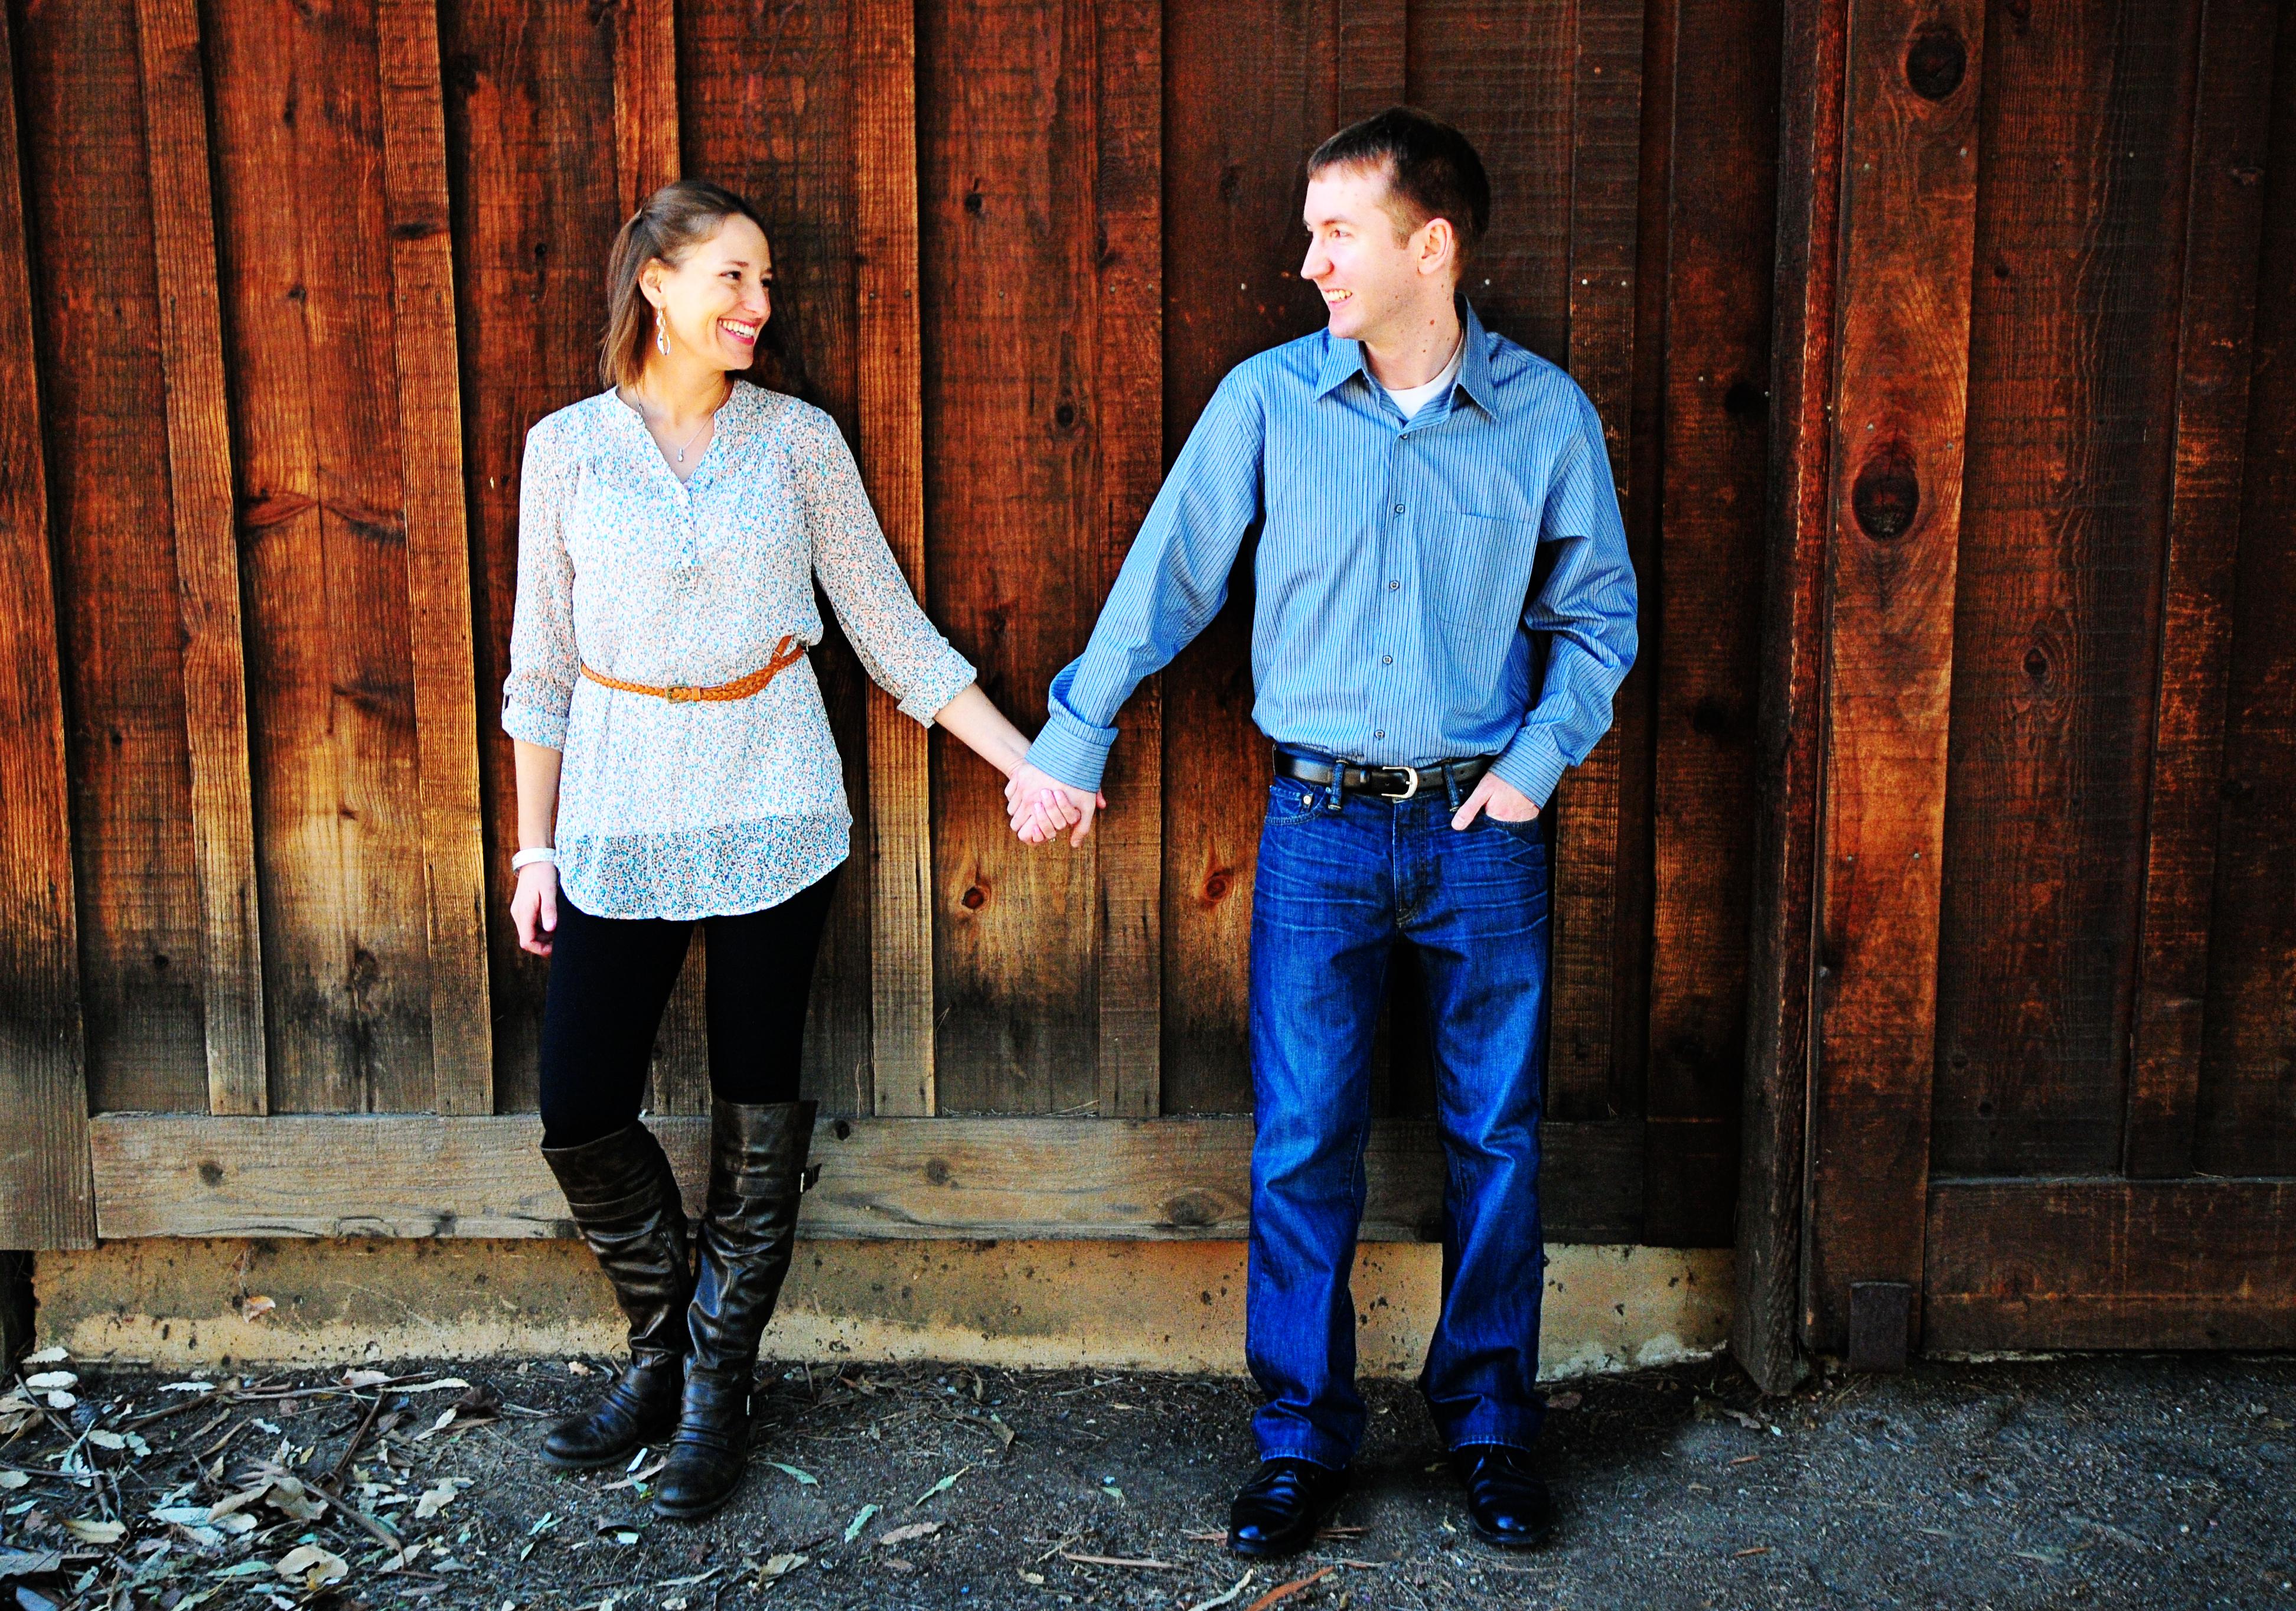 la joll engagement, san diego engagement, couple's portraits. la joll asunset, engagement portraits, old poway railroad engagement